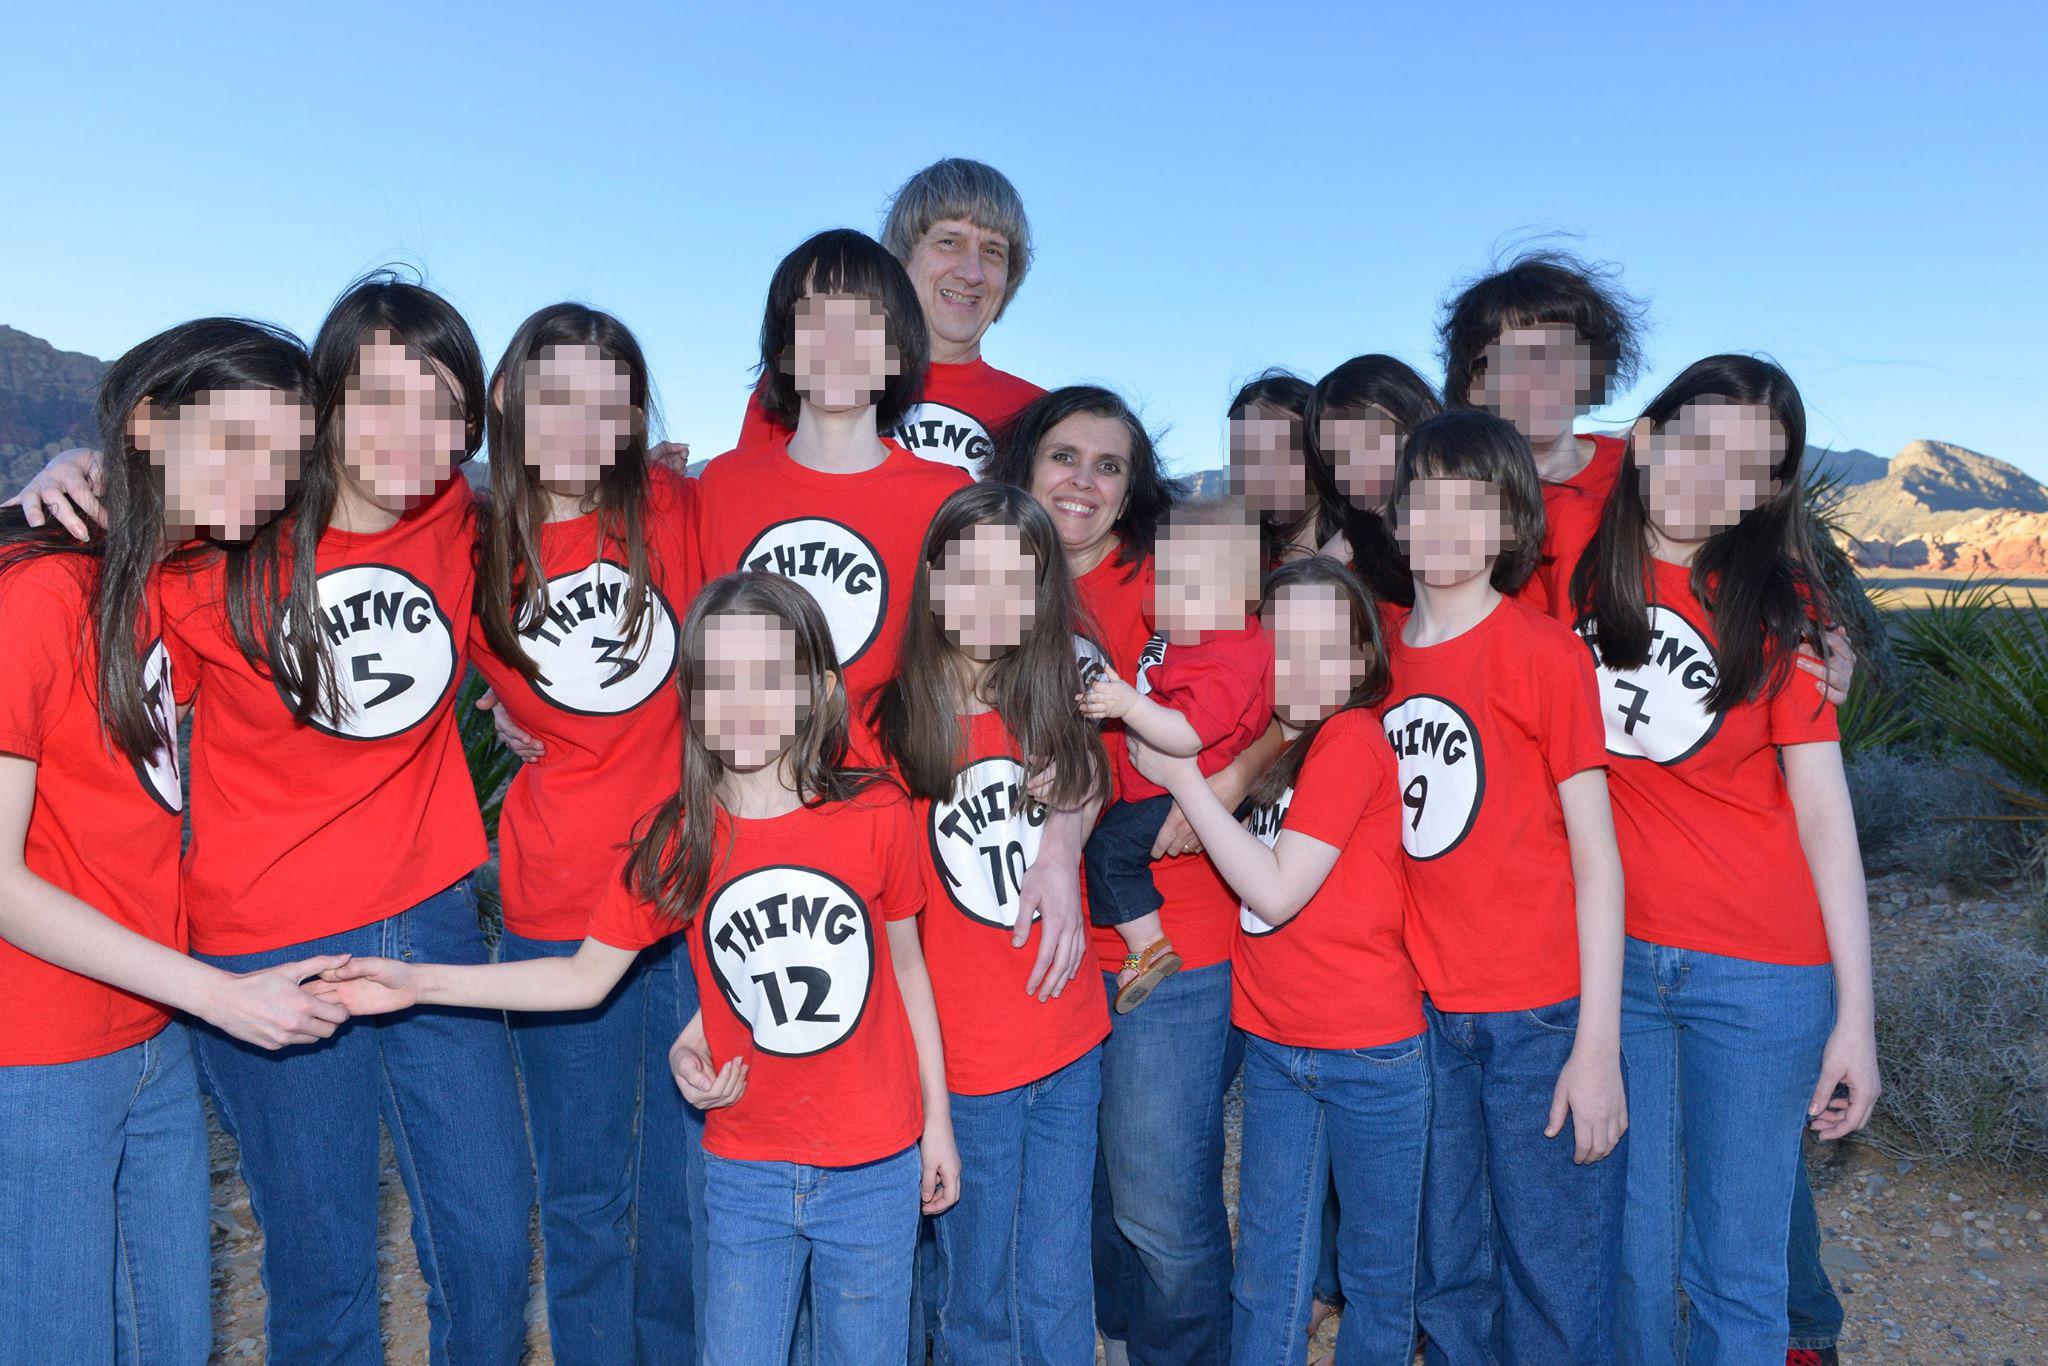 turpin-family.jpg